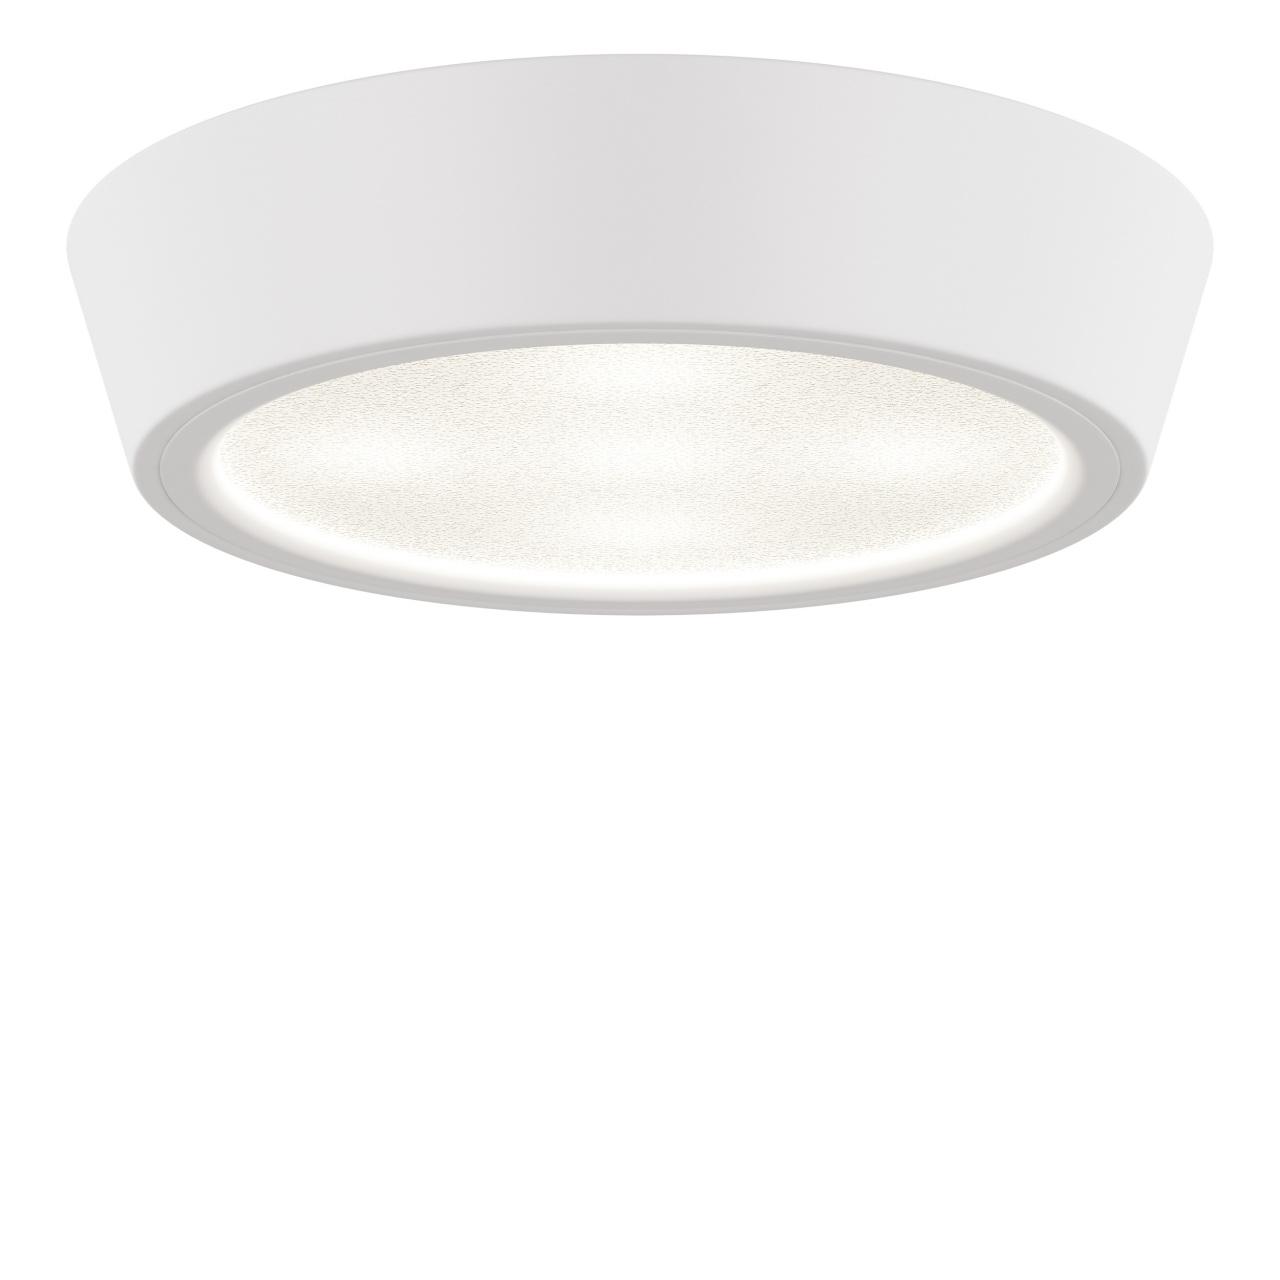 Светильник Urbano Mini LED 8W 770LM белый 4000K IP65 Lightstar 214704